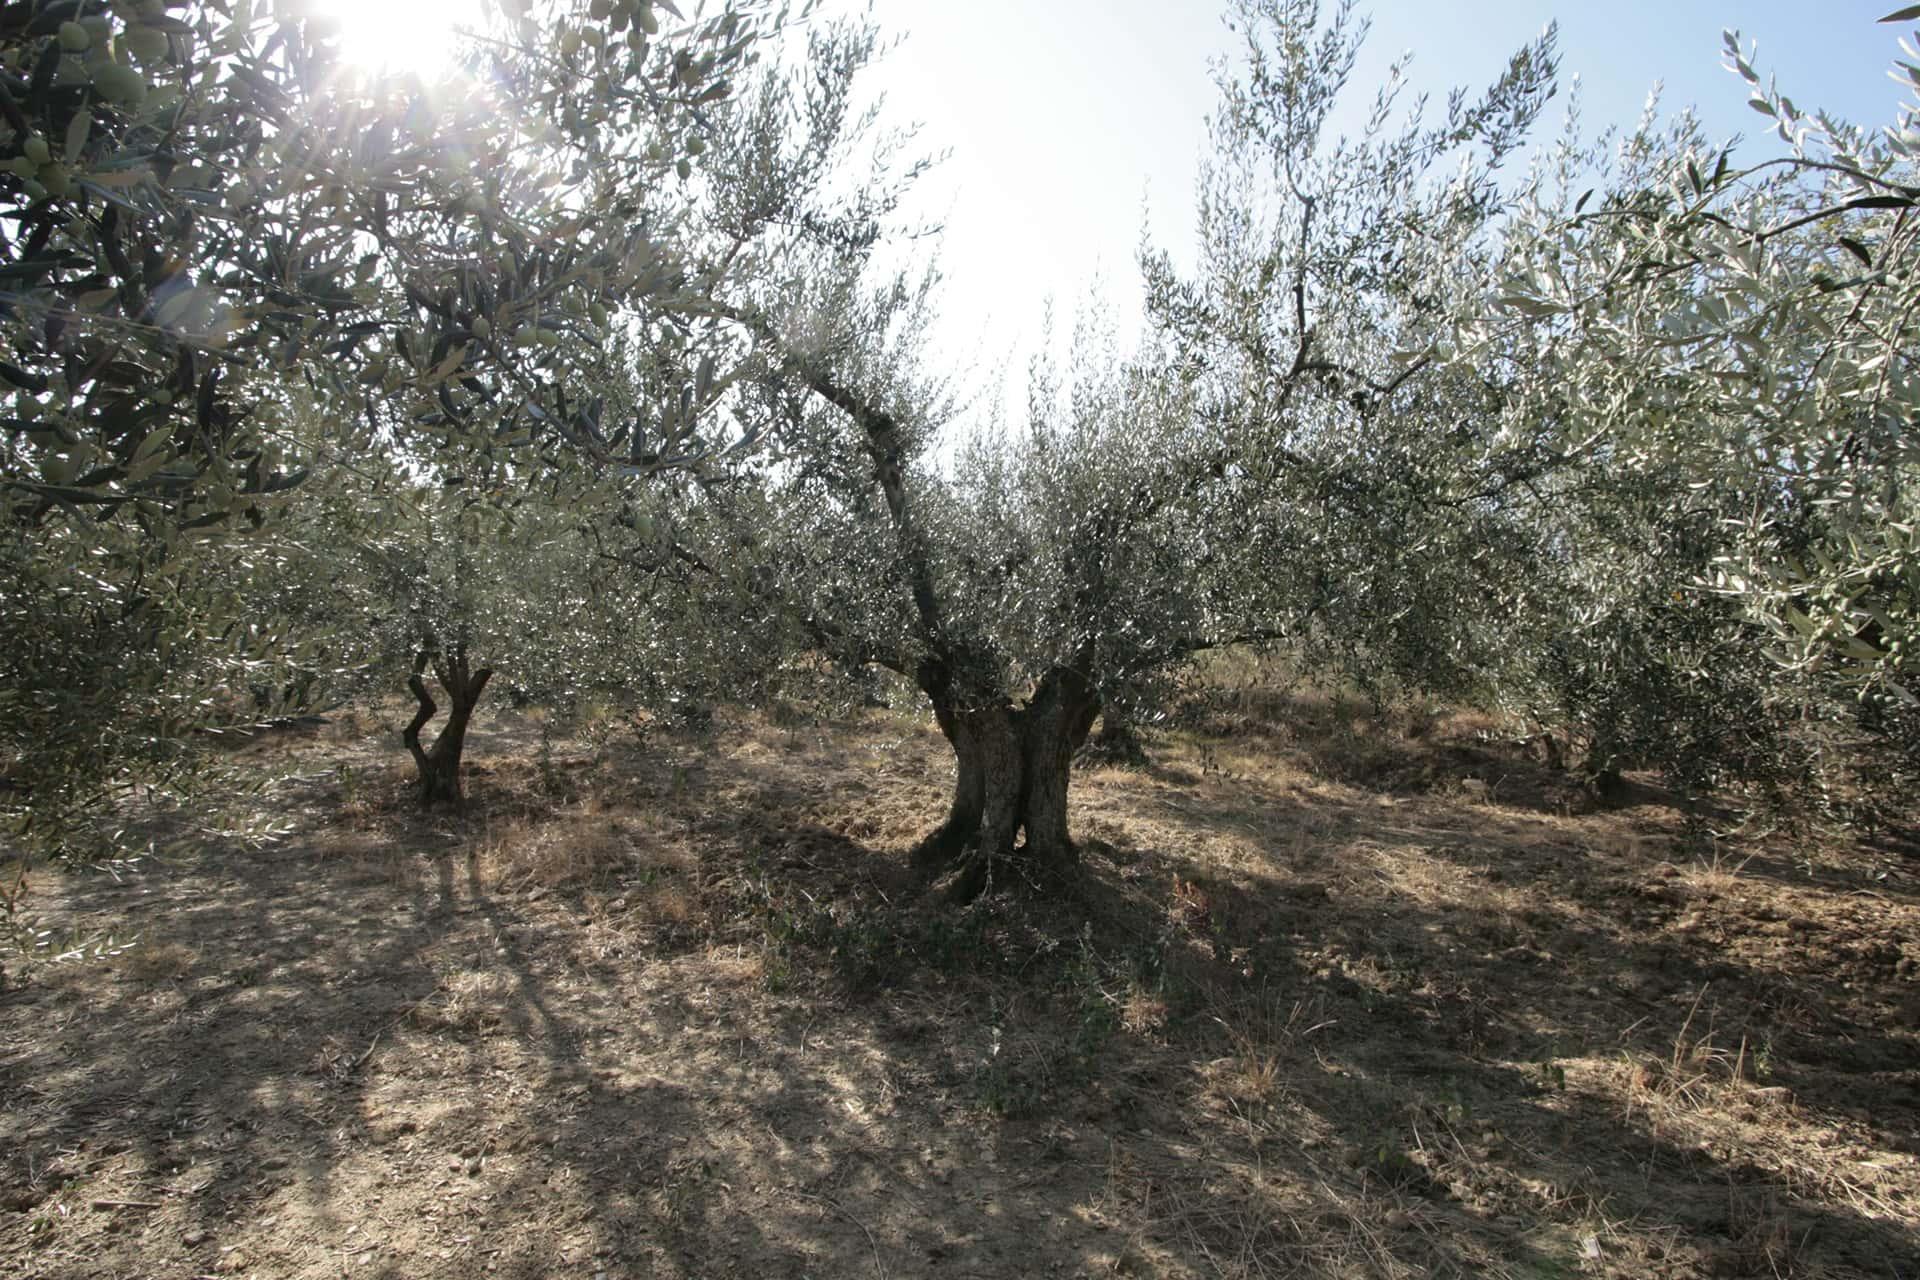 Tour in bici, trekking, vendemmia e cena in agriturismo in Toscana